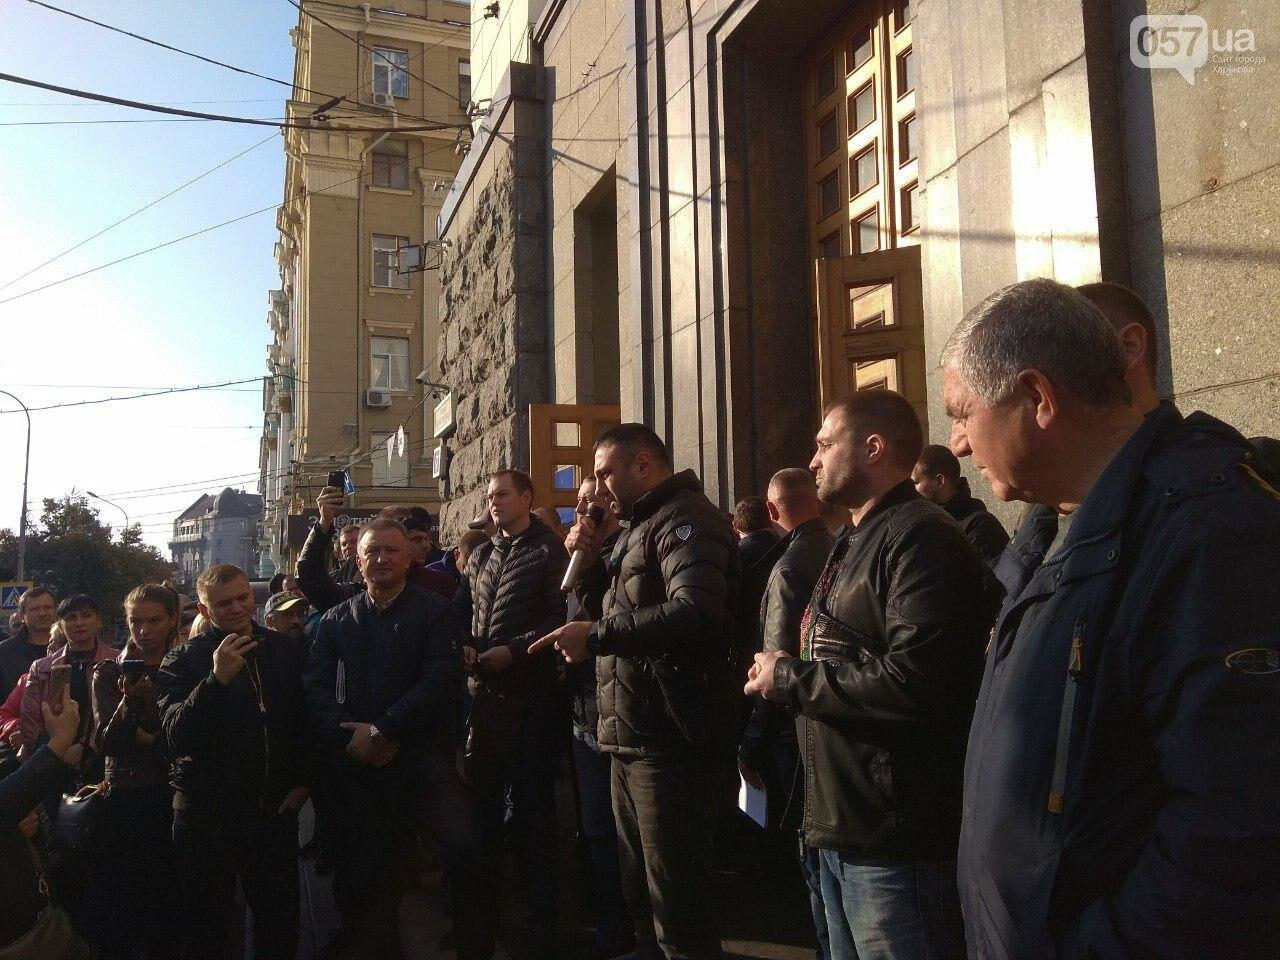 «Нам дорога не нужна»: предприниматели «Барабашово» пикетируют горсовет, - ФОТО, фото-4